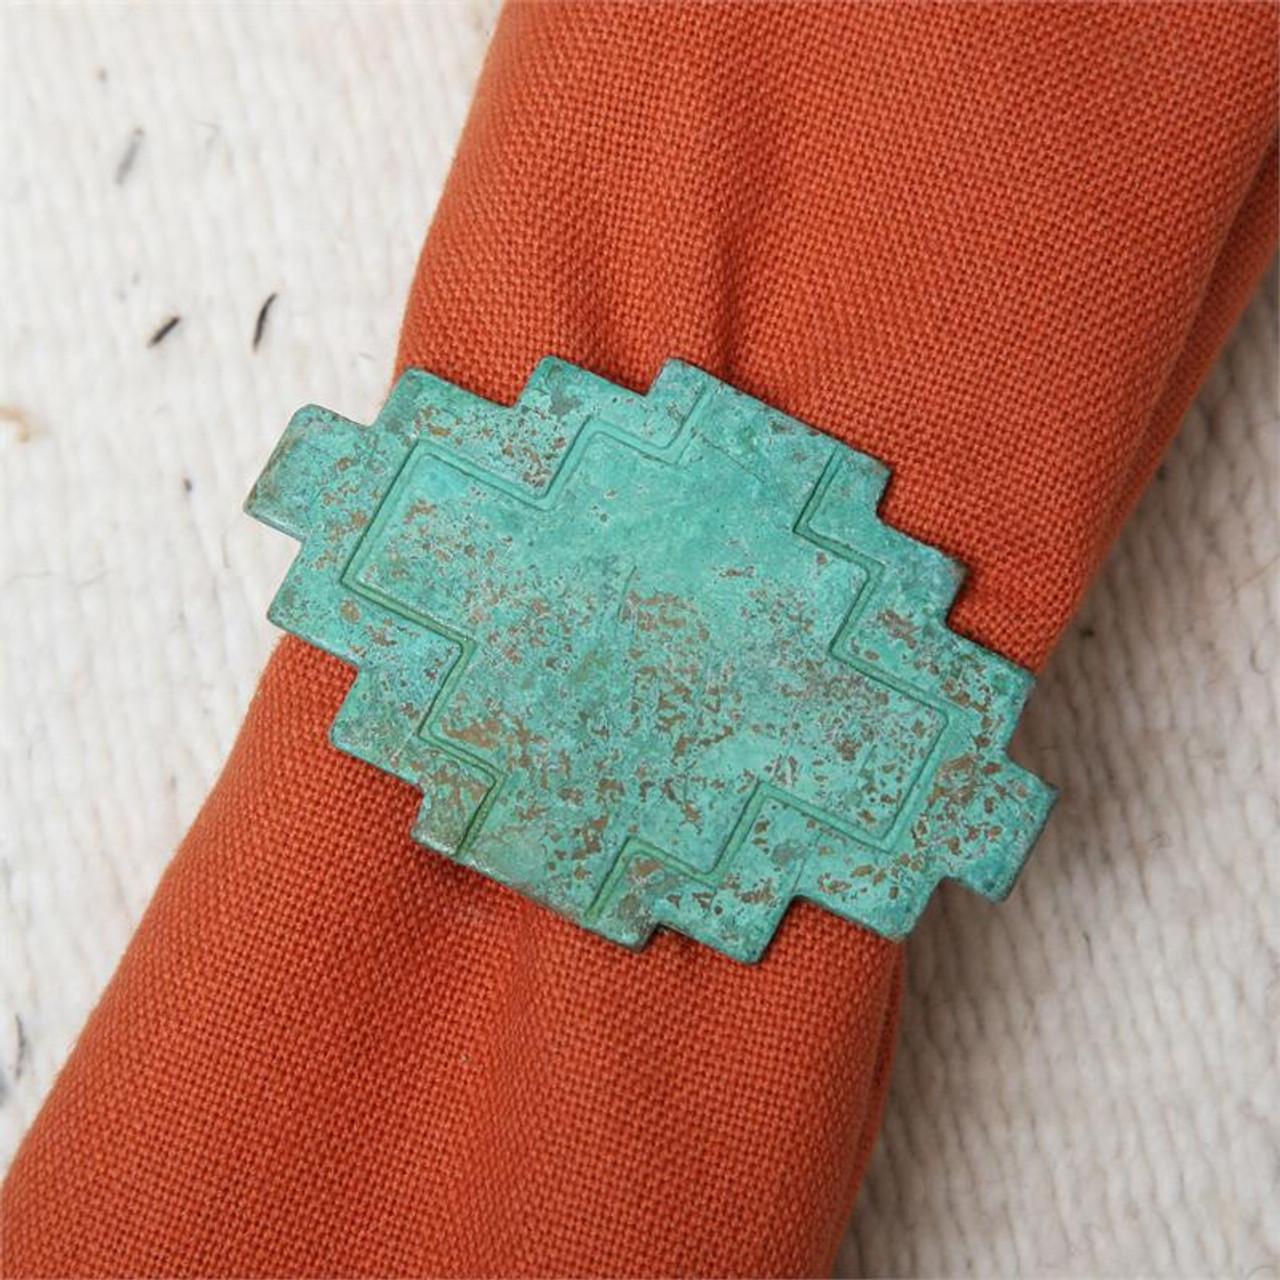 Adobe Patina Napkin Ring